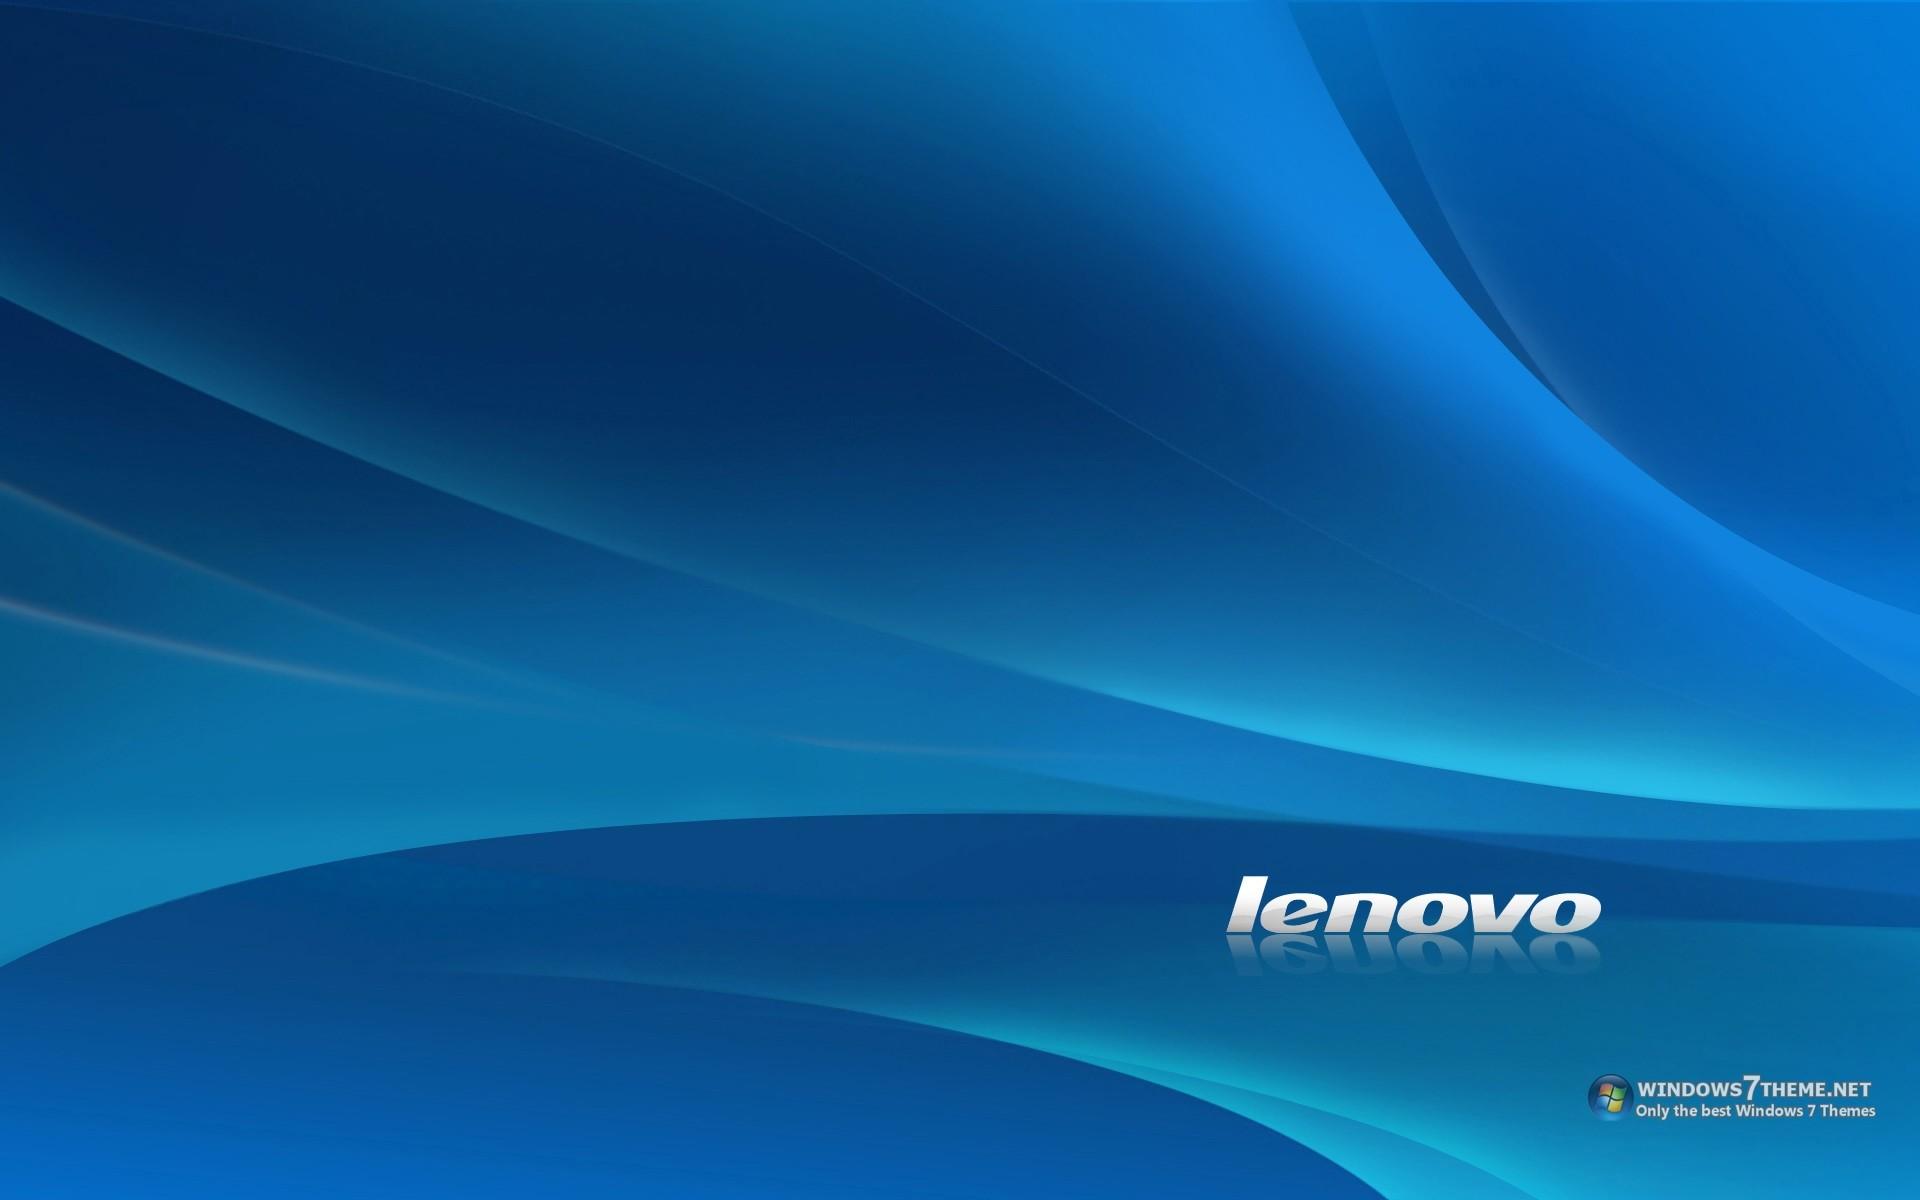 Best Windows 10 Wallpaper Hd Tema Windows 7 Lenovo